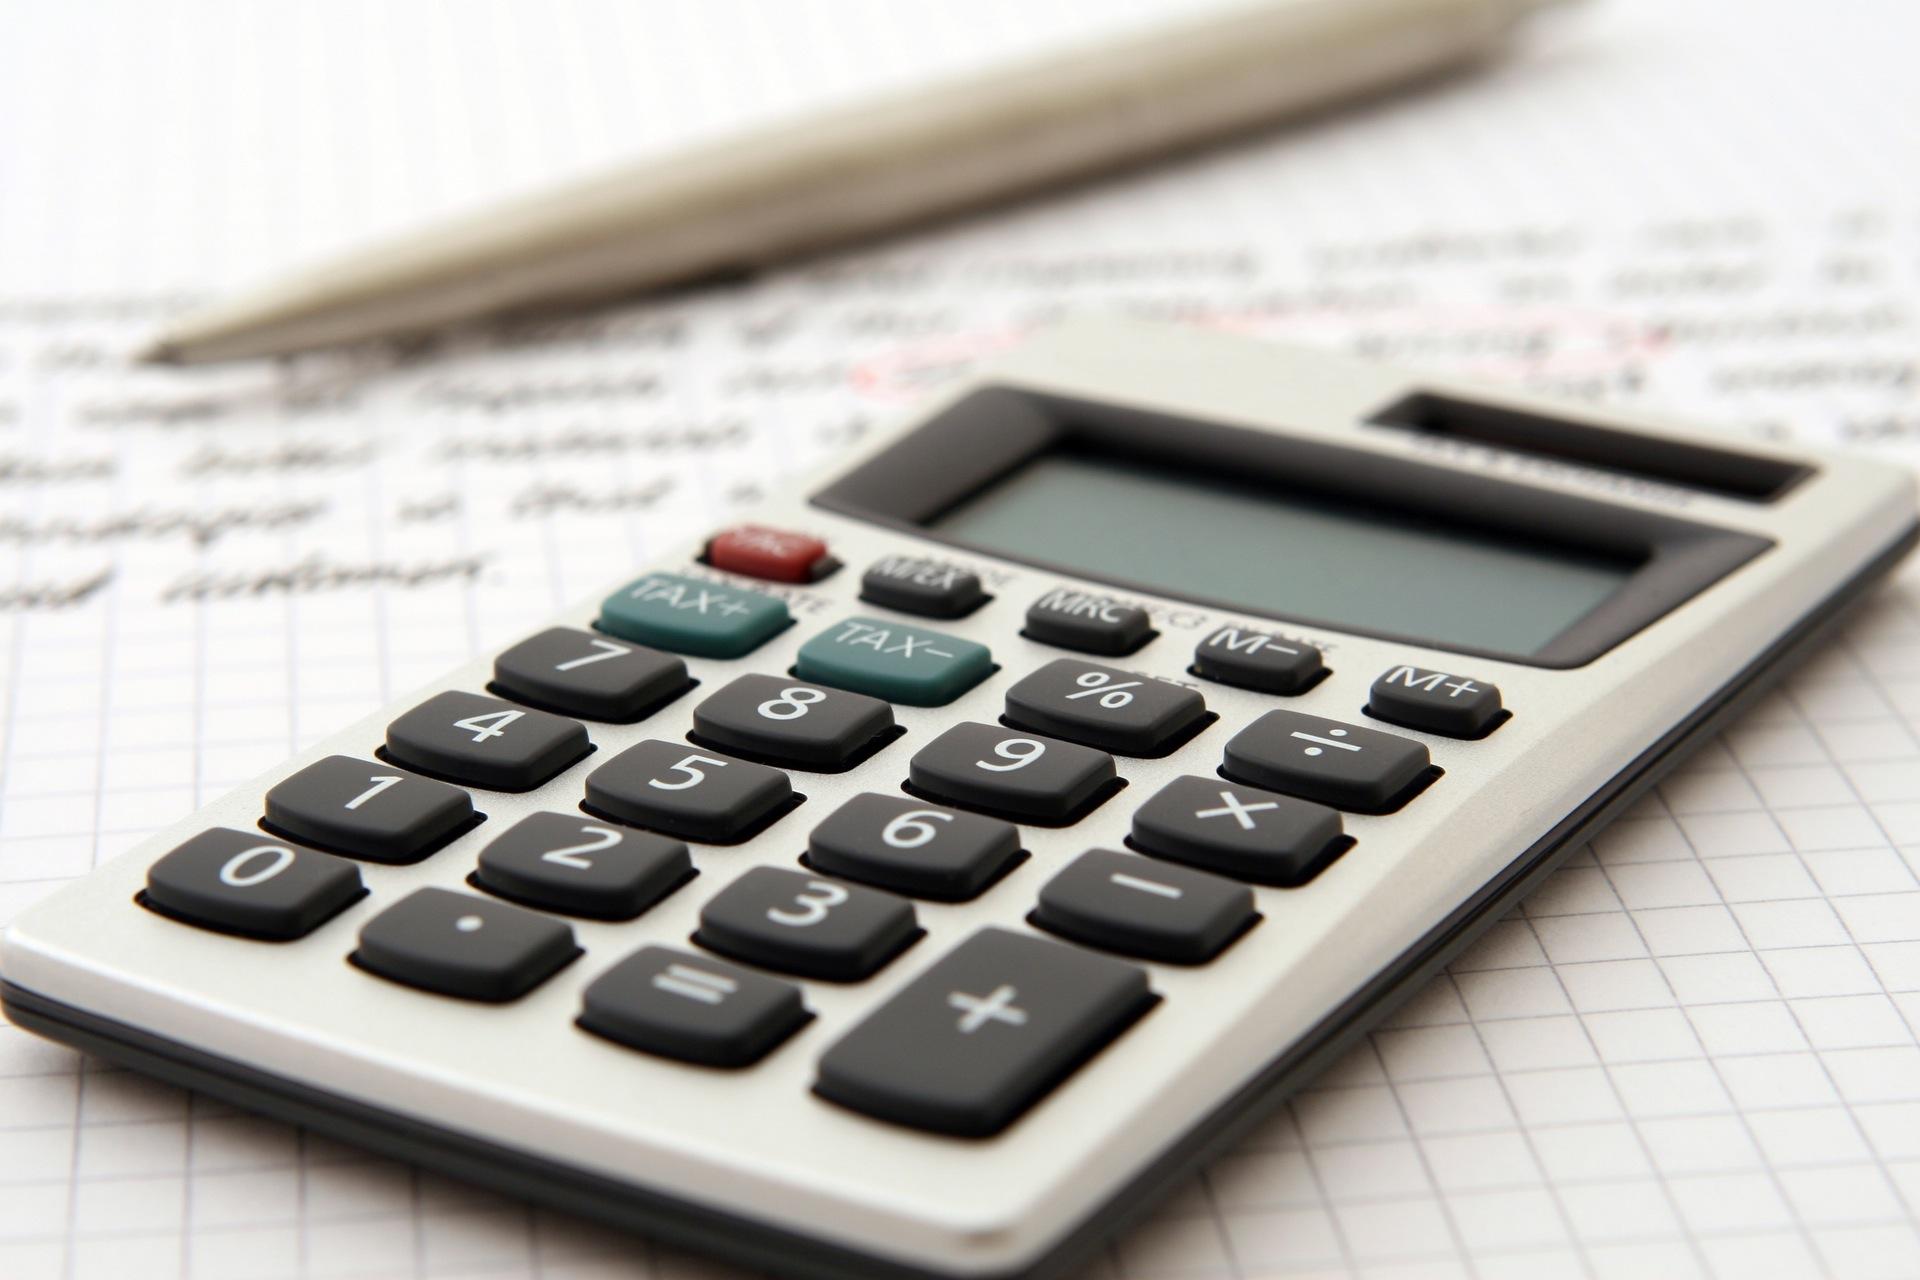 Immobilie Geerbt Welche Steuern Mussen Gezahlt Werden 123makler De